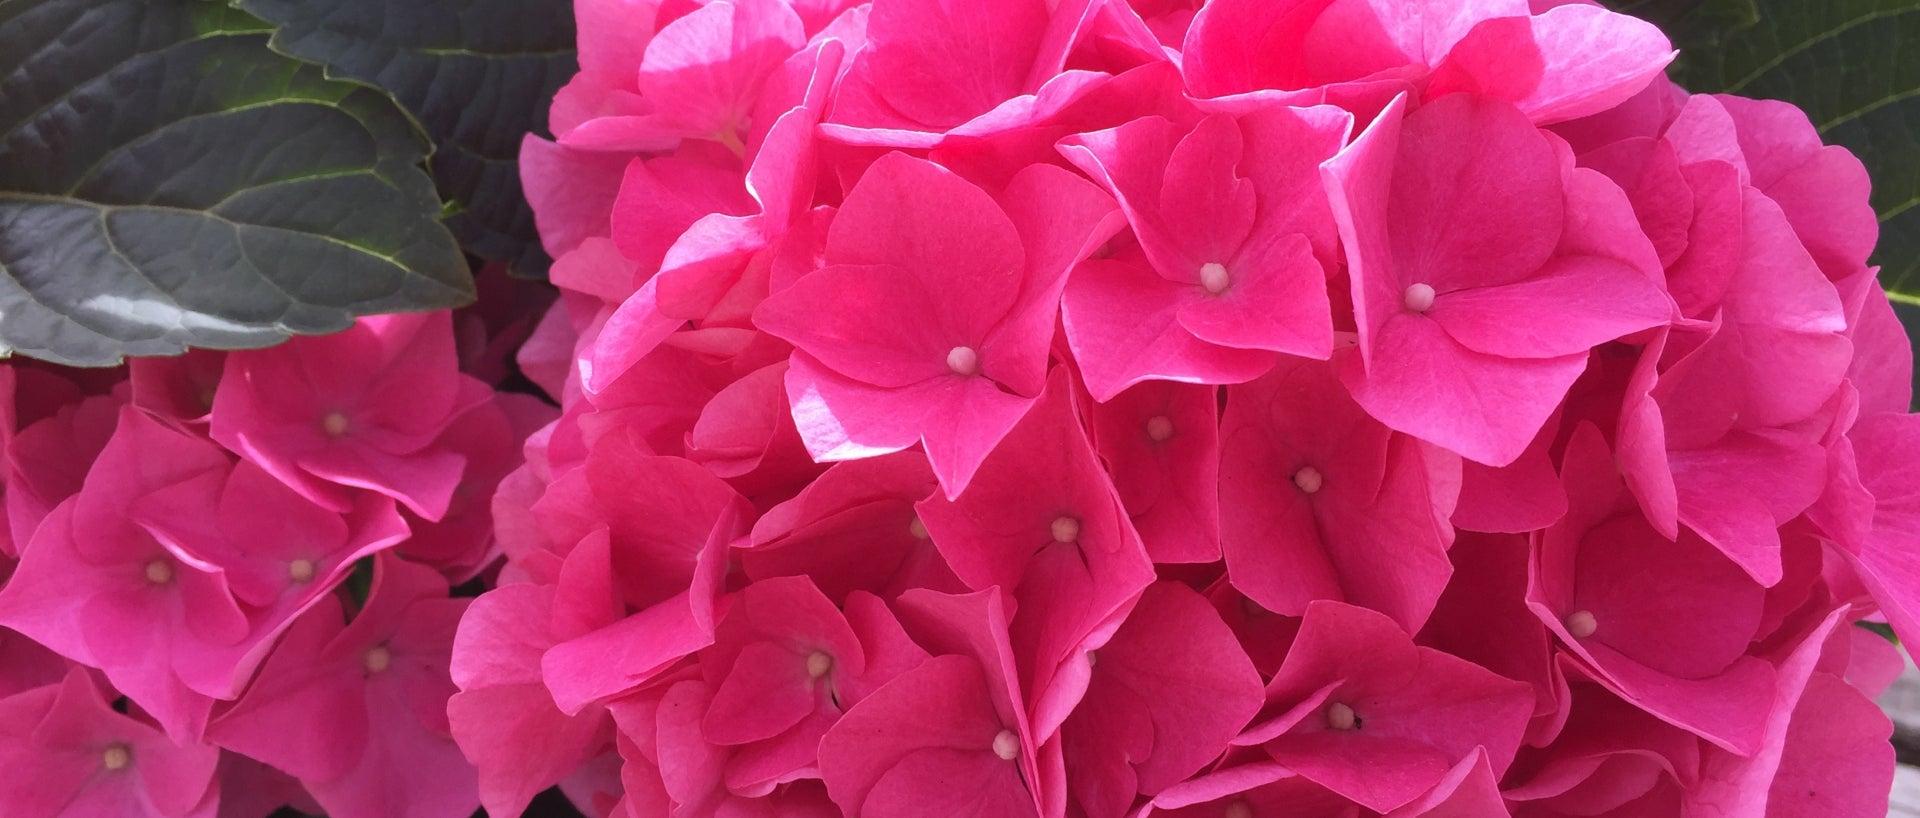 Up close pink hydrangea